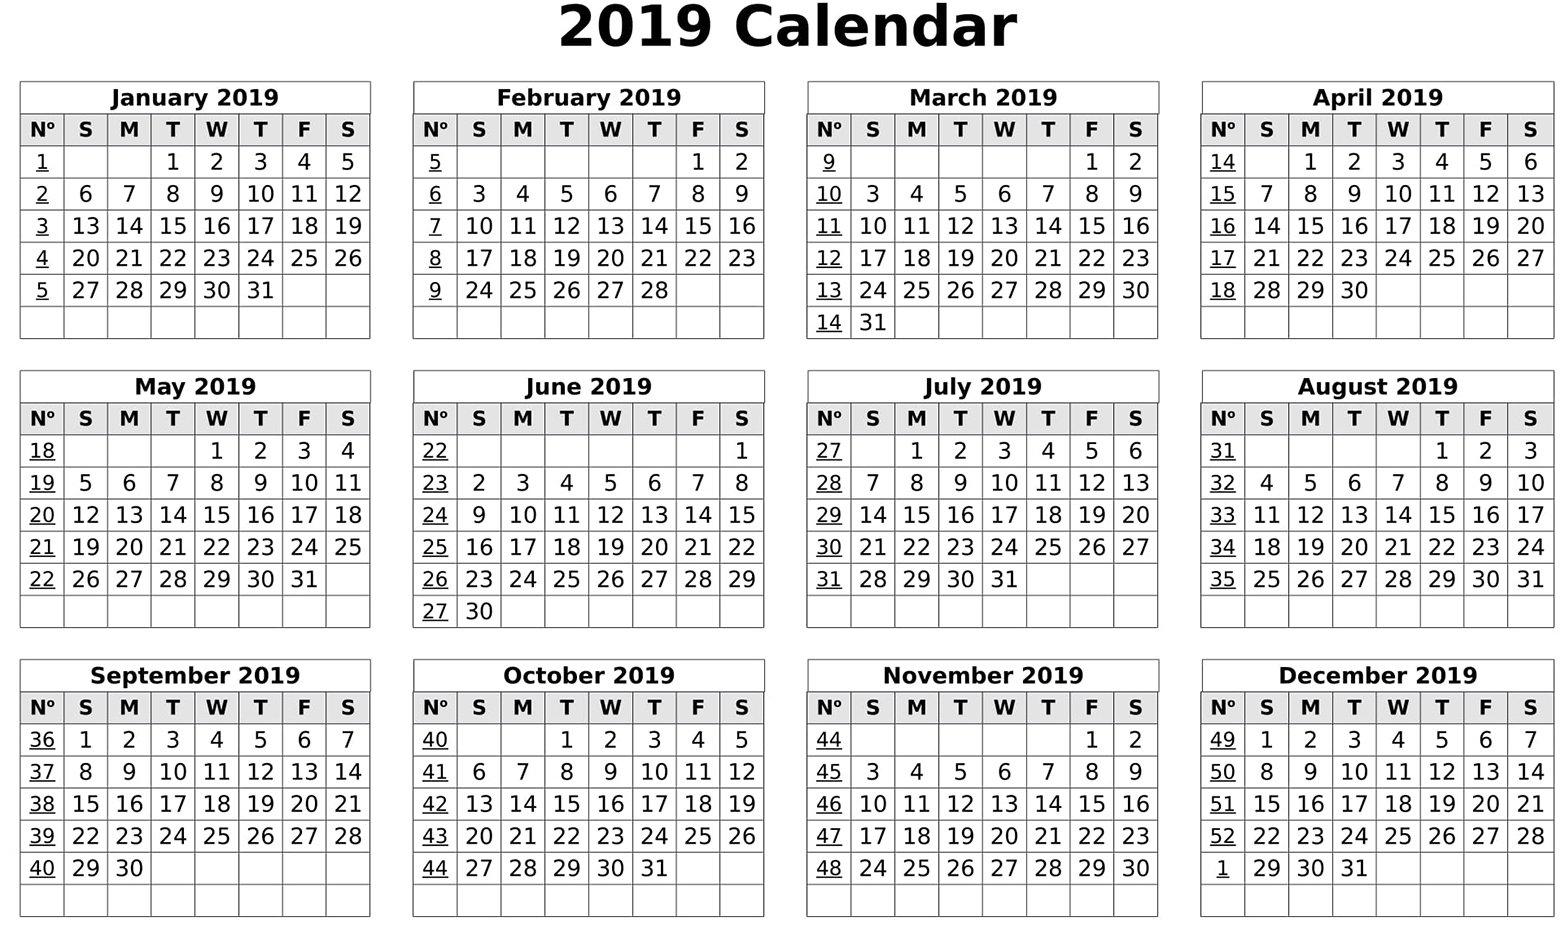 Calendar 2019 Print Out   Free Printable 2018 Calendar Template Word Calendar 2019 To Print